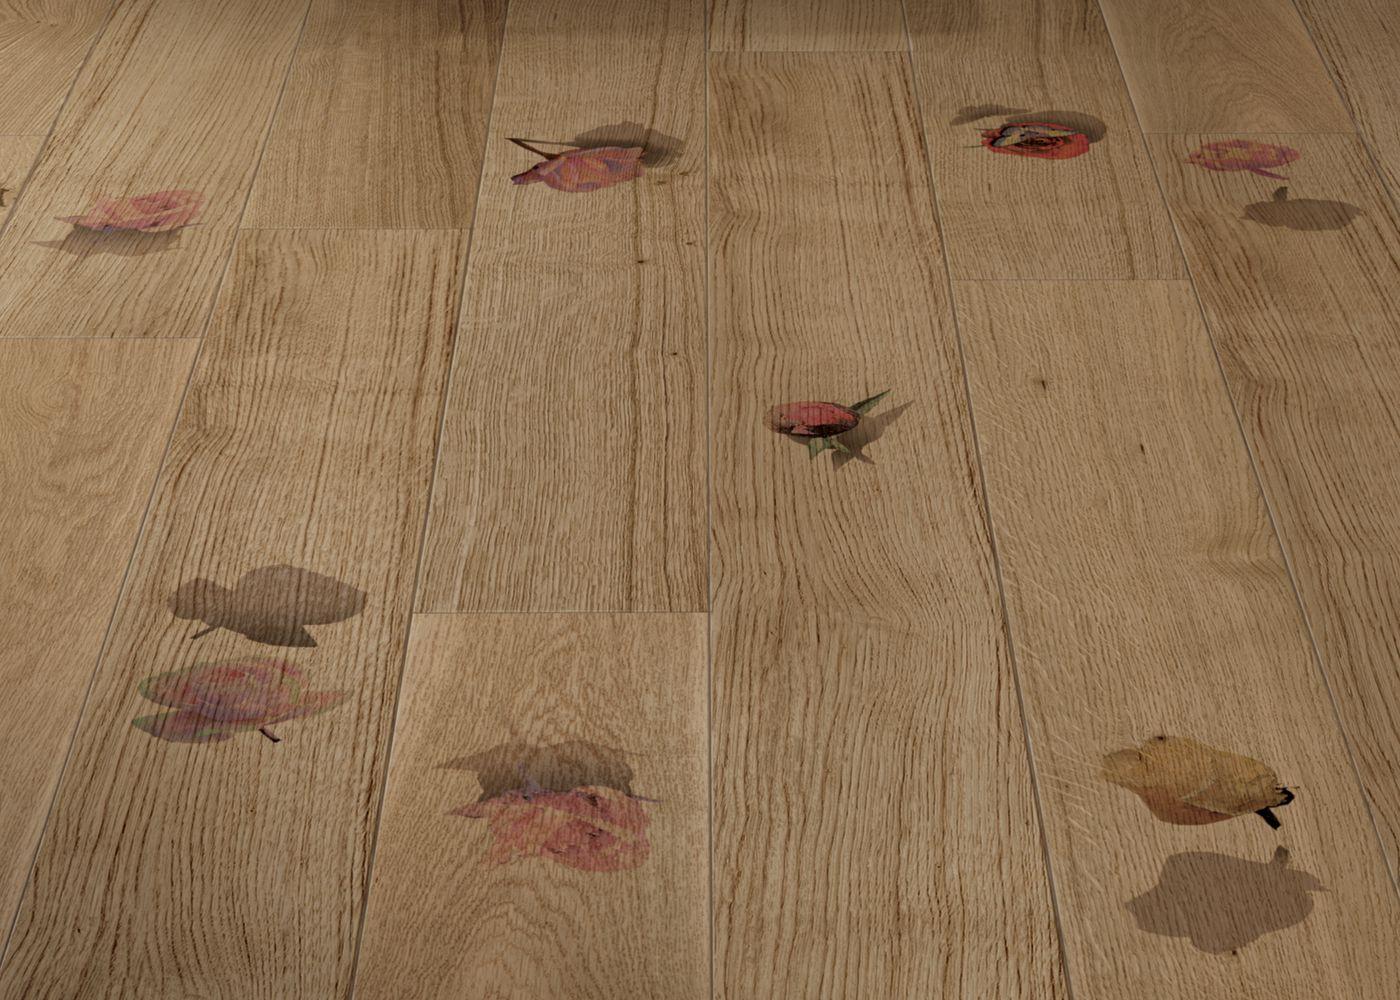 Rosae 1 - Parquet Contrecollé Chêne PR Bis Contemporain Vernis Brossé Mat Teinte Naturelle - Design Rosae 1 - (Cinzia Anguissola )